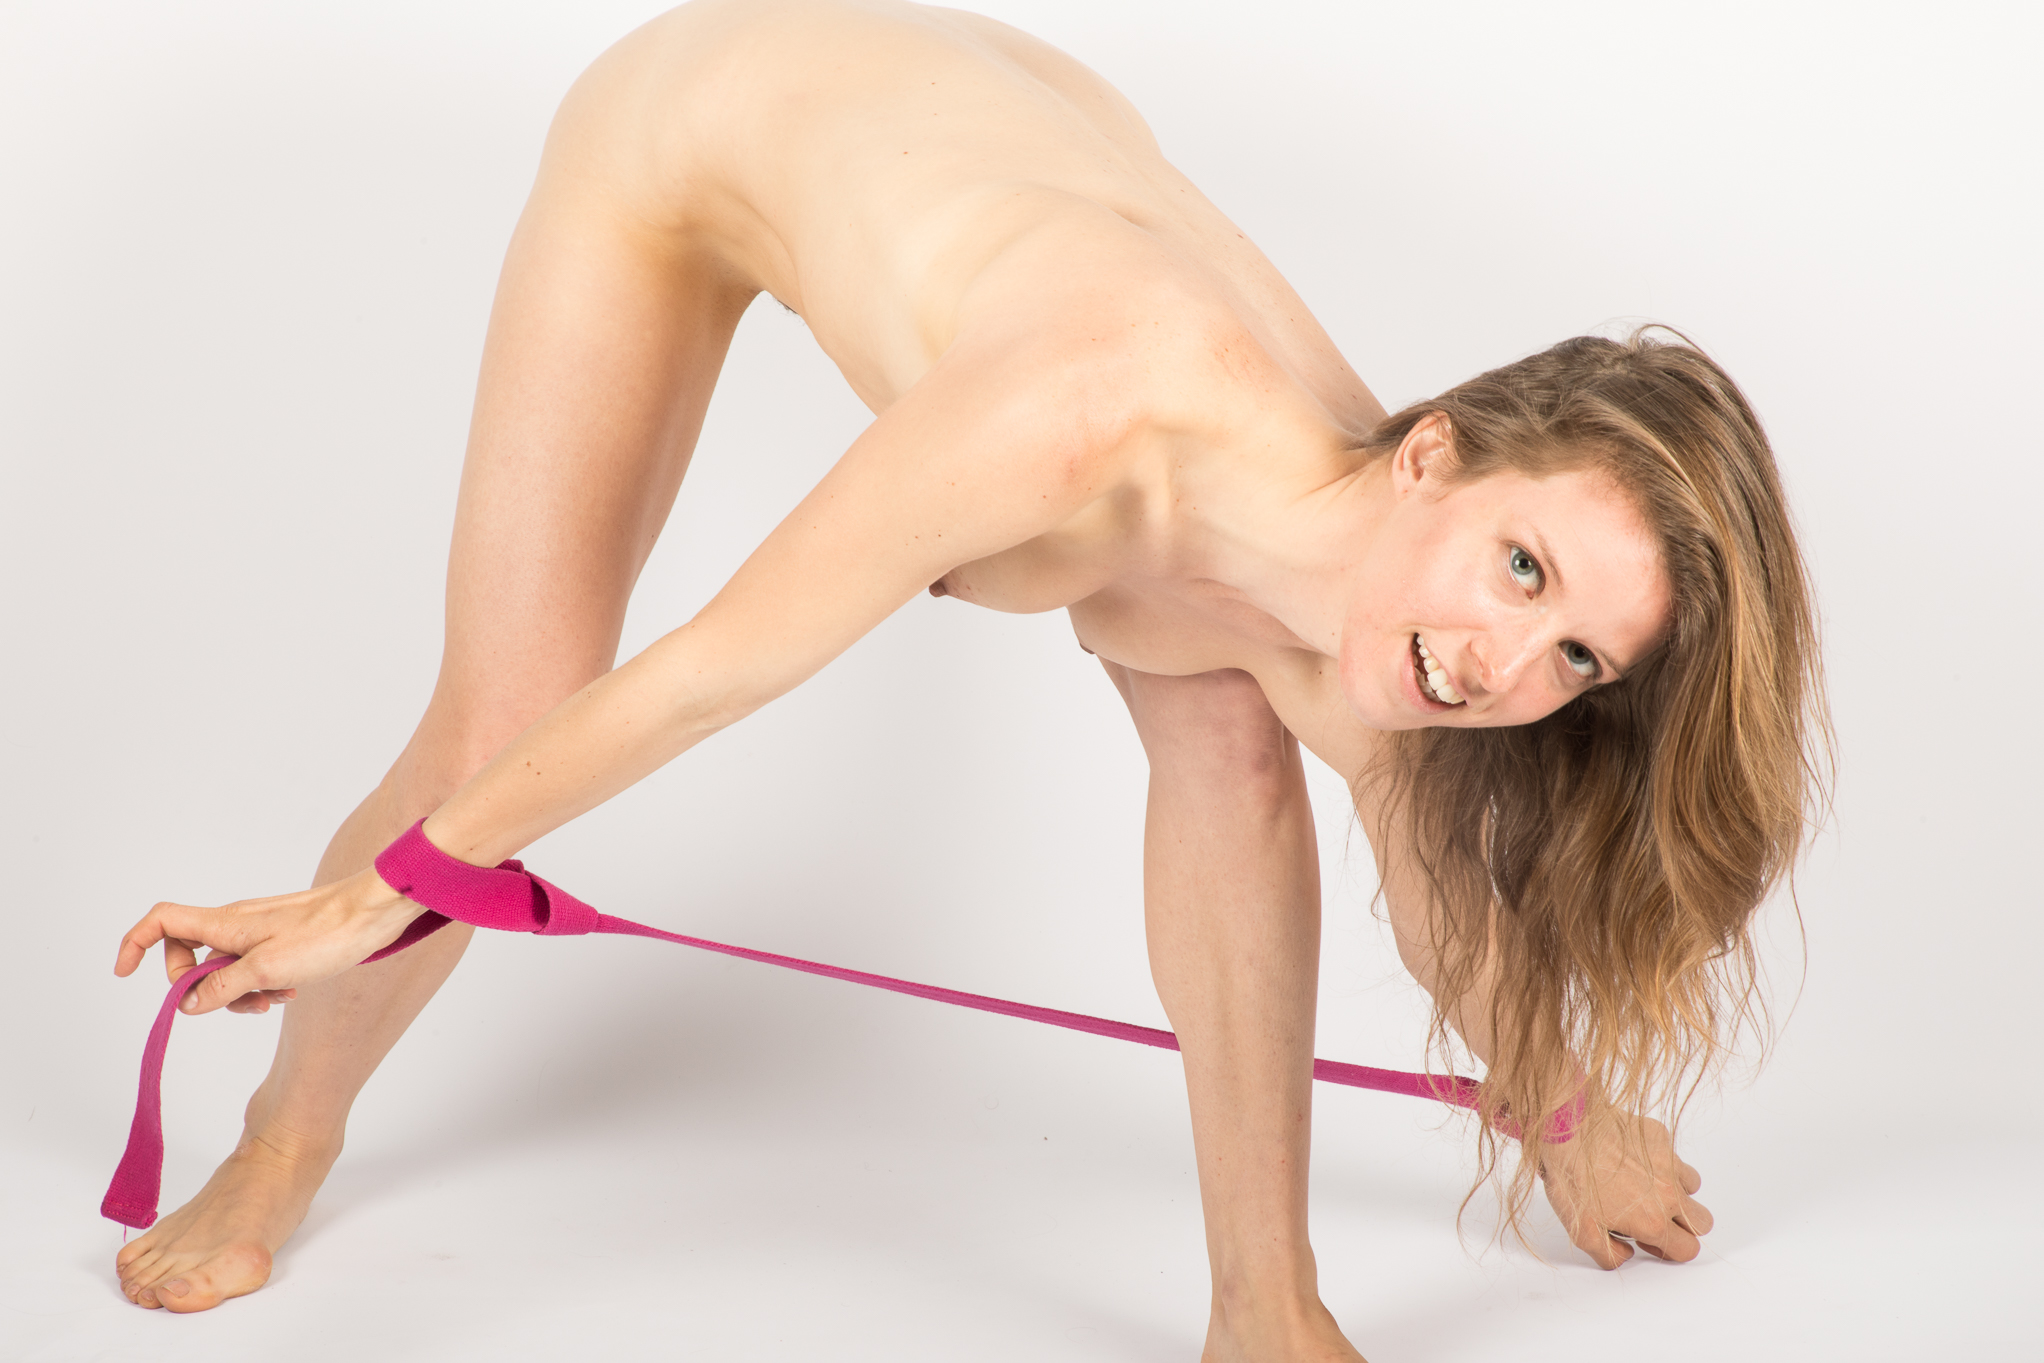 7217-Kat Peterson, NSFW, Nude, Photoshoot, Studio.jpg